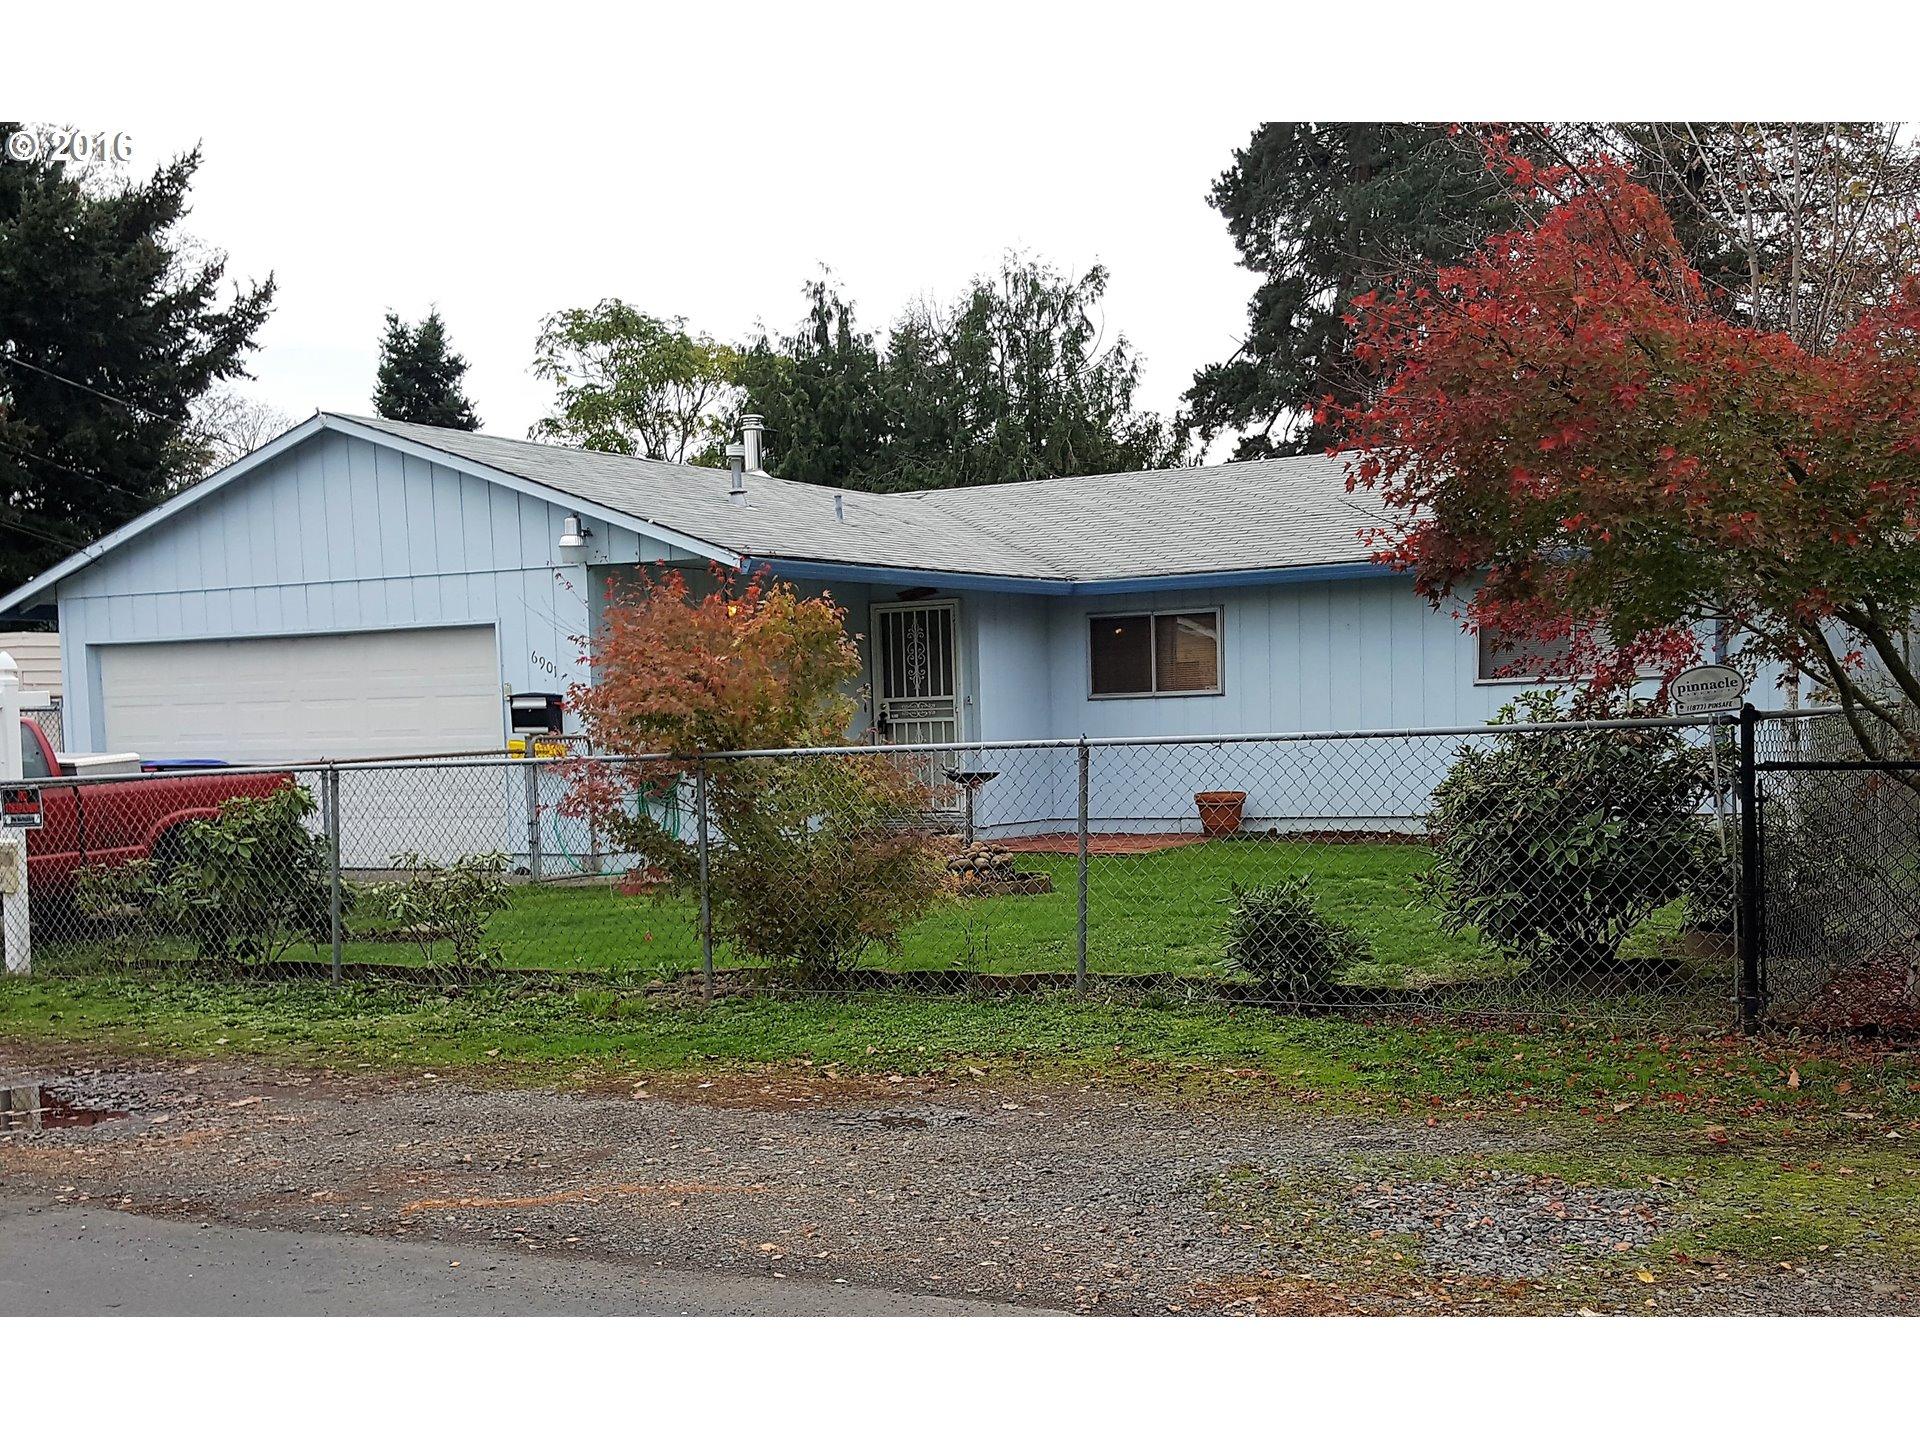 6901 SE 78TH AVE, Portland OR 97206